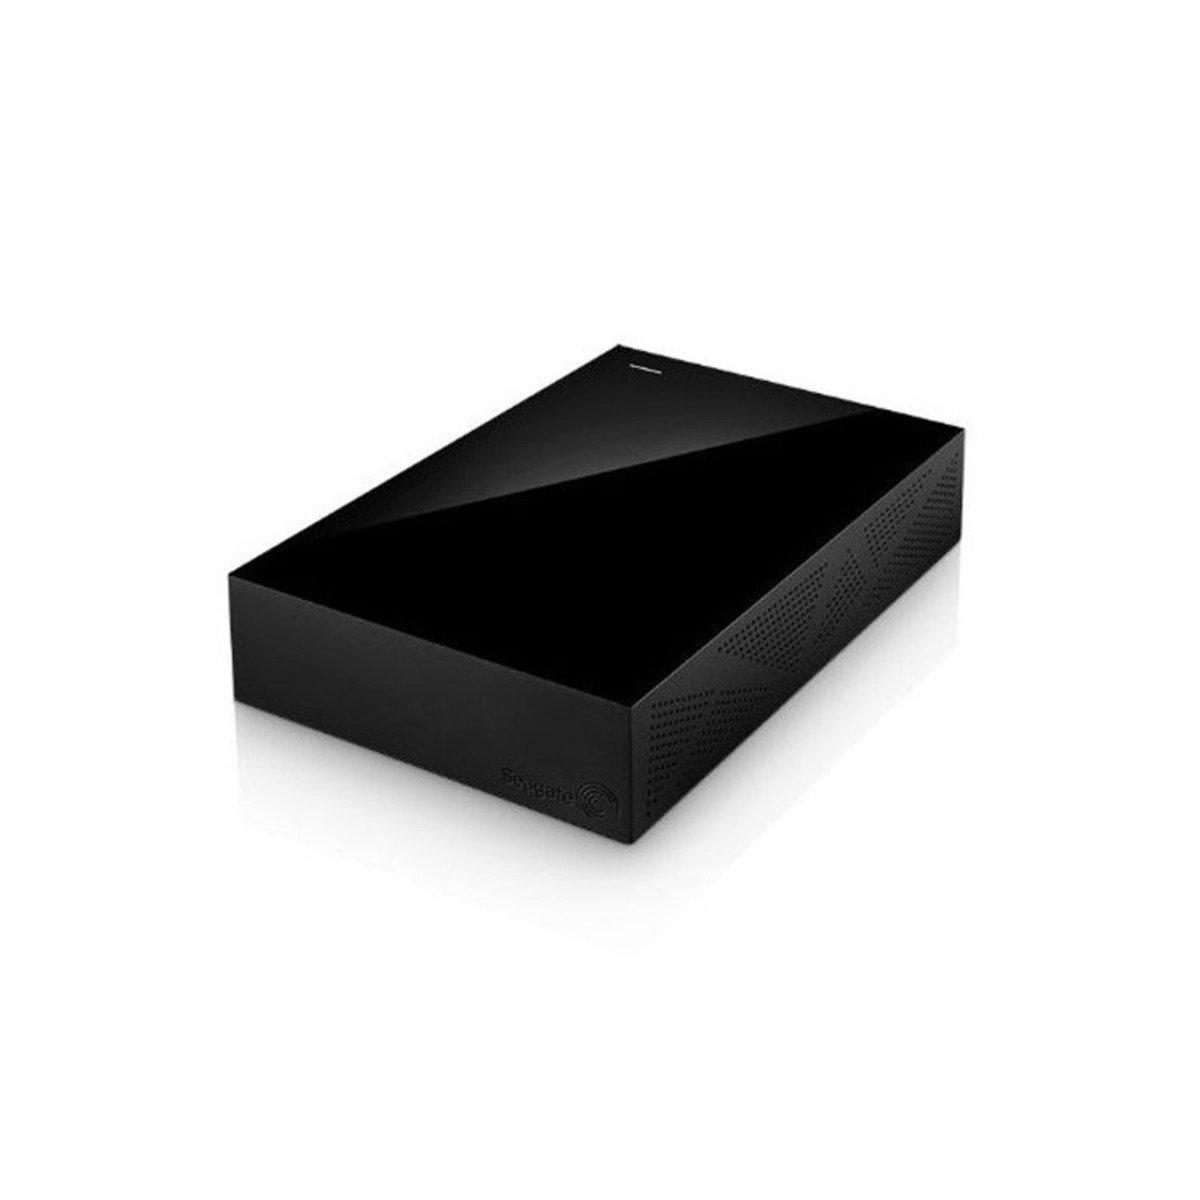 Backup Plus 6TB USB 3.0 3.5吋 外置硬碟 STDT6000300